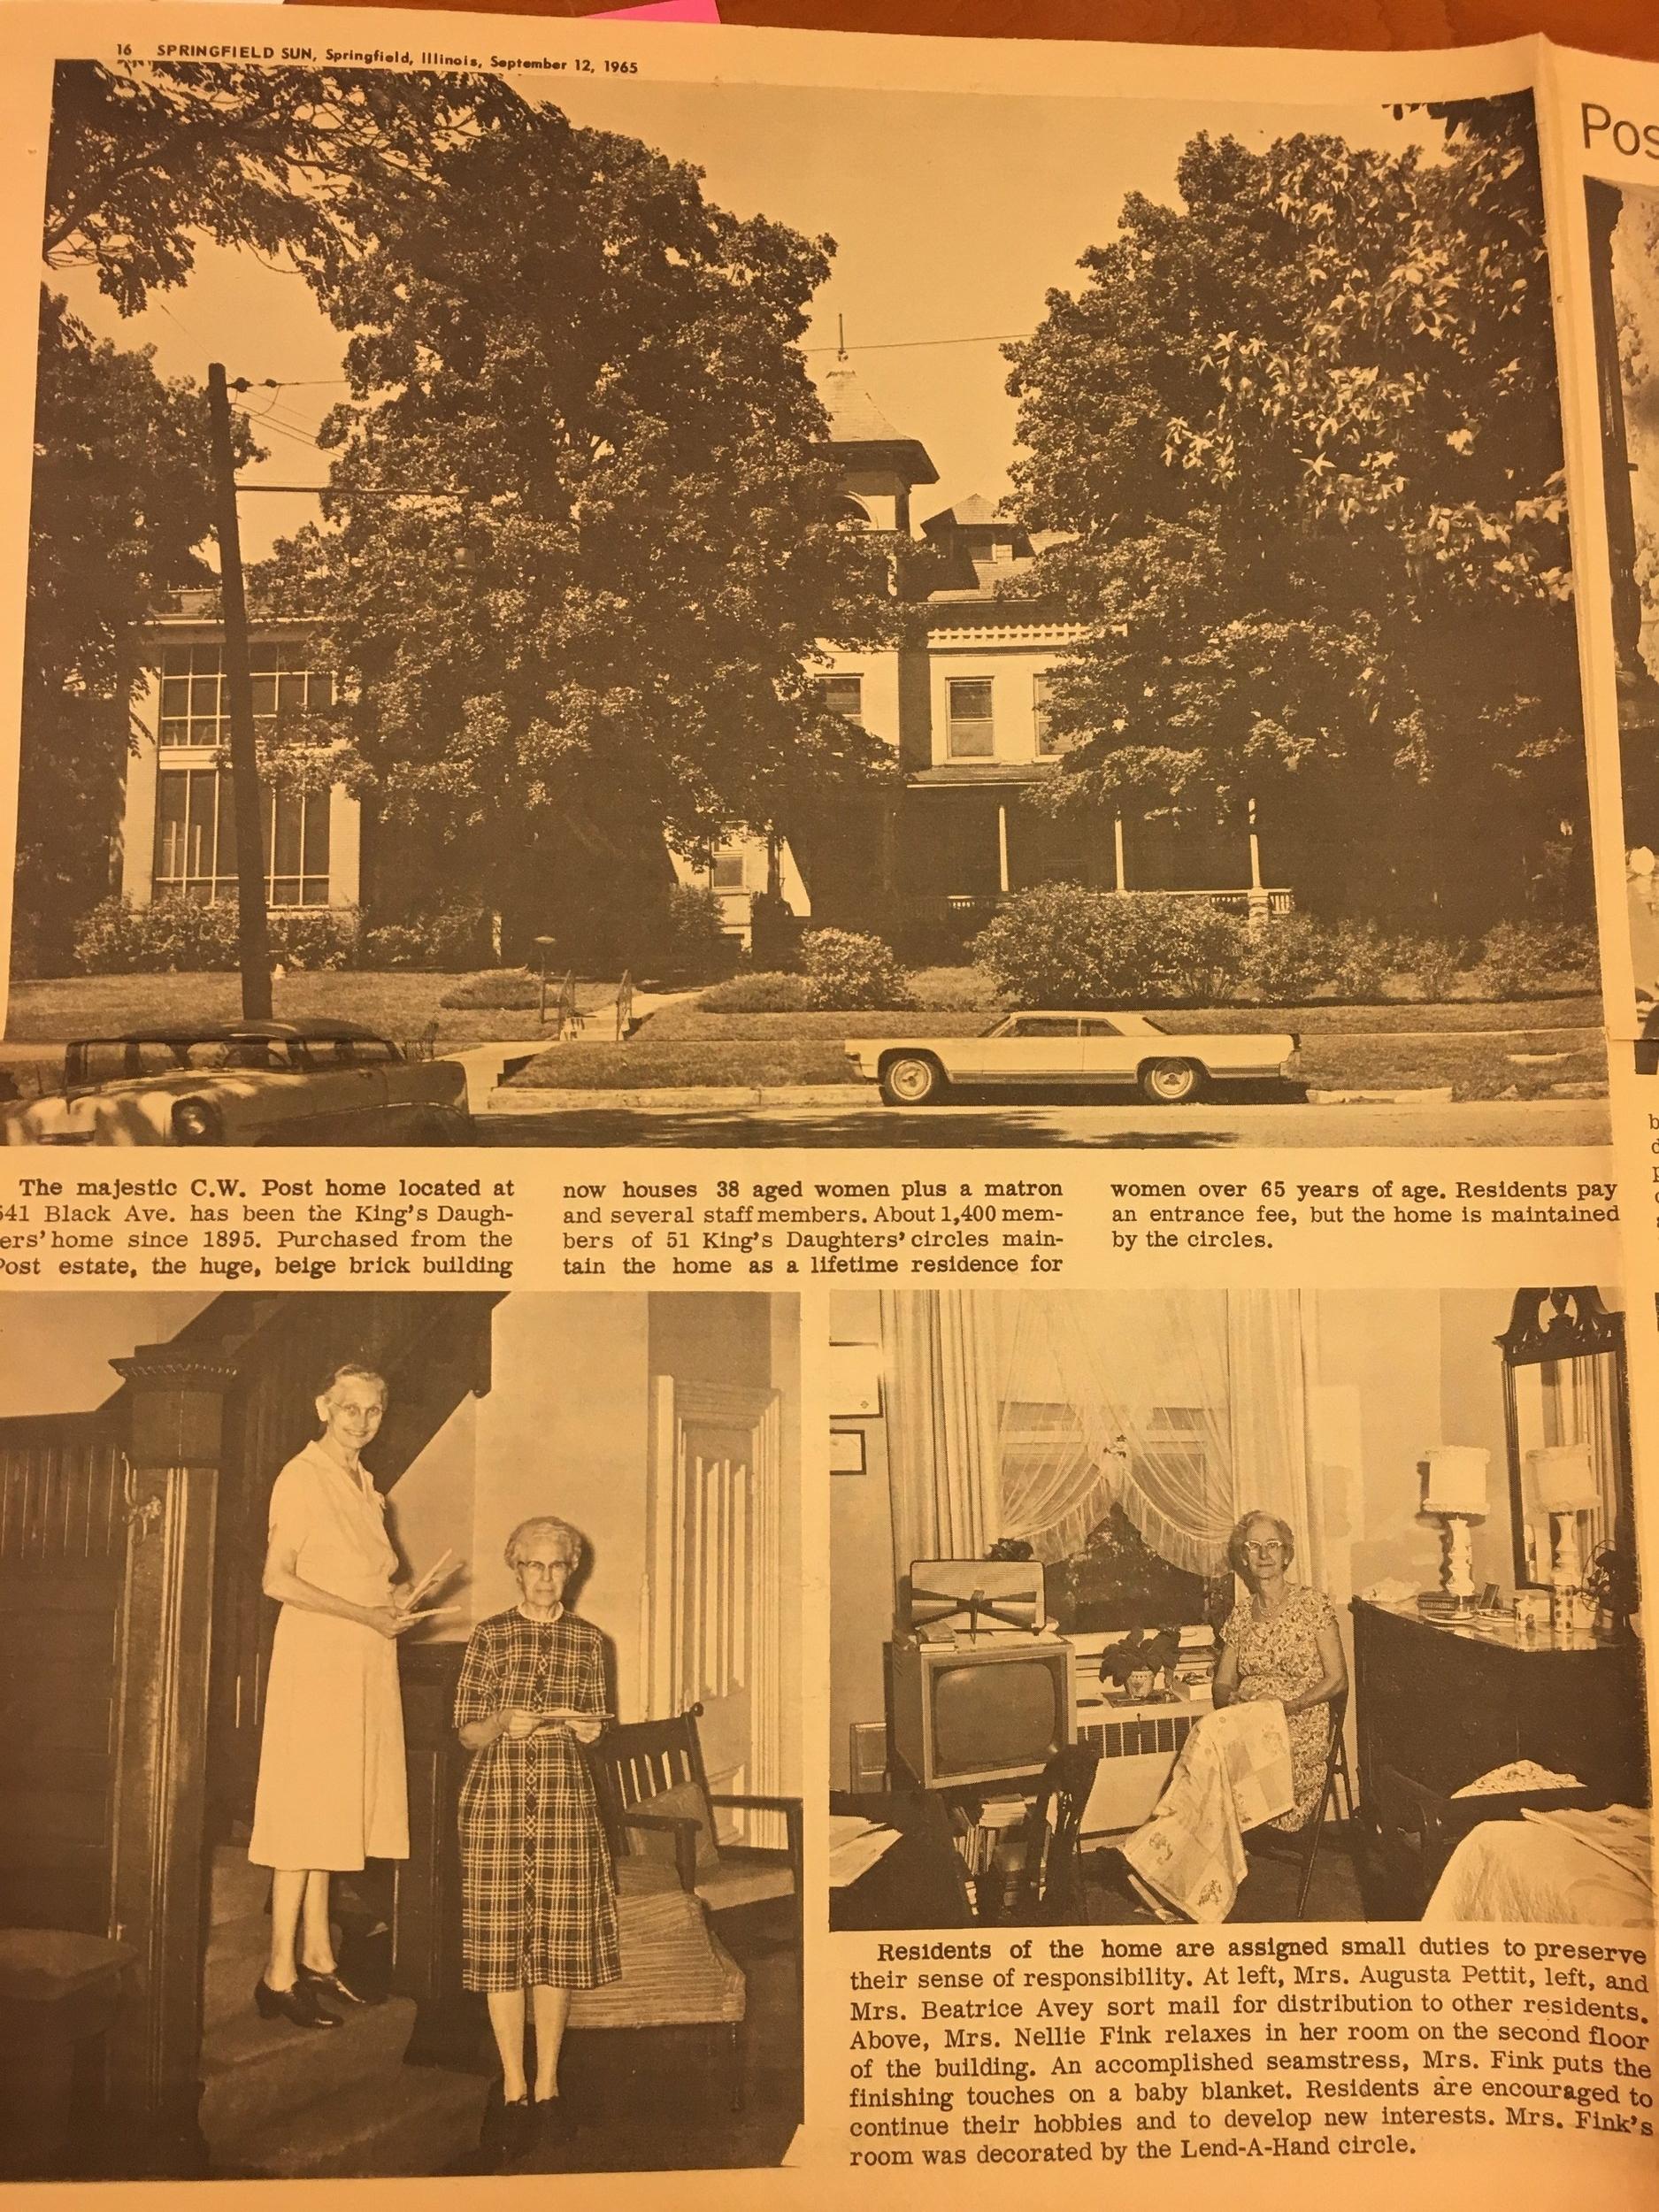 SJR 1969 page 1 (75 ann) article.jpg